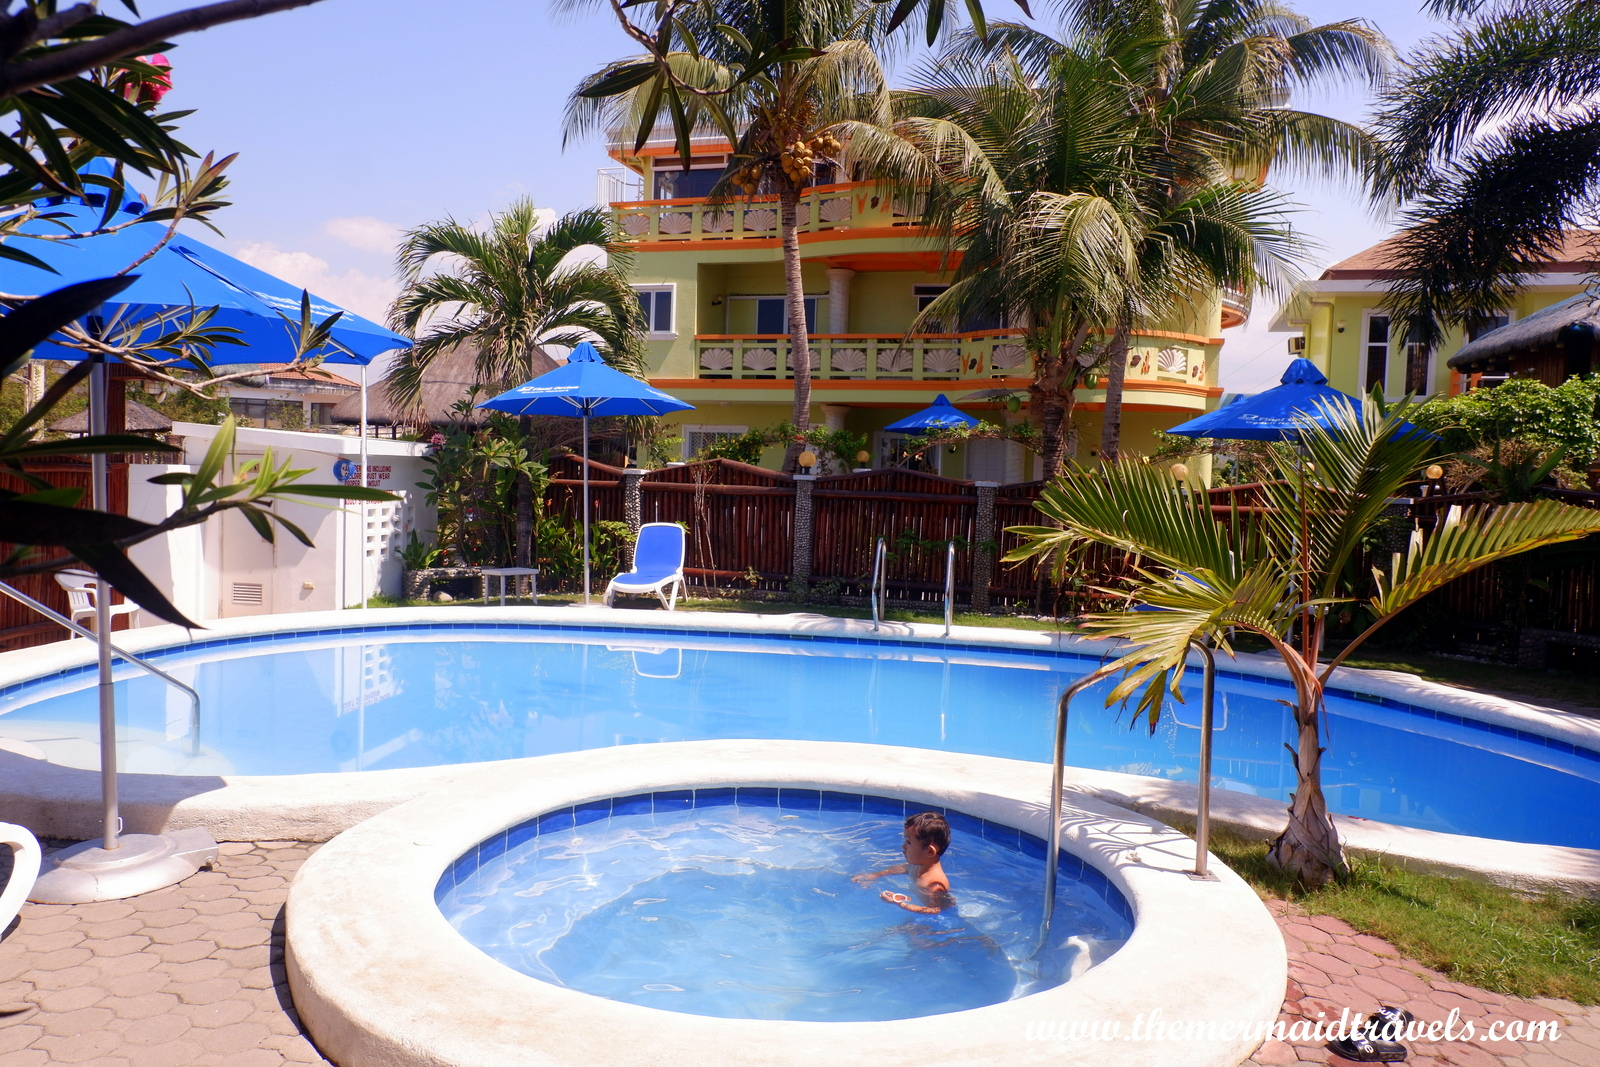 P M Final Option Beach Resort San Juan The Mermaid Travels